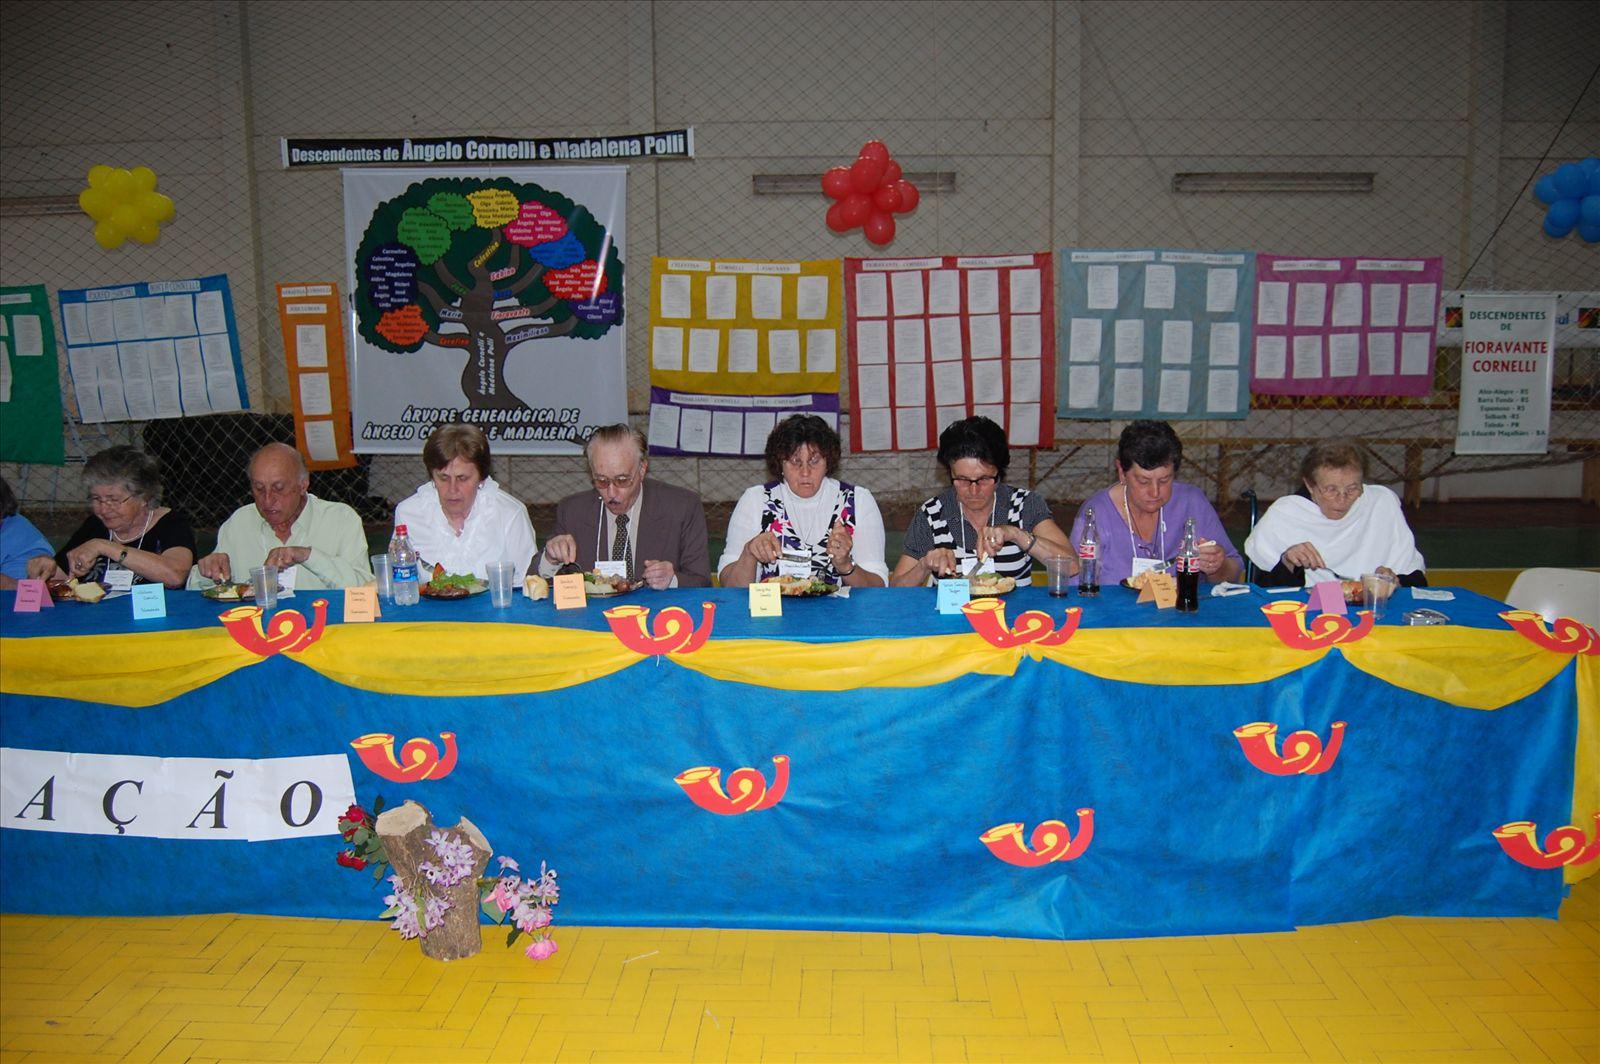 2º Encontro Família Cornelli - 11.10.2009 (235)_0